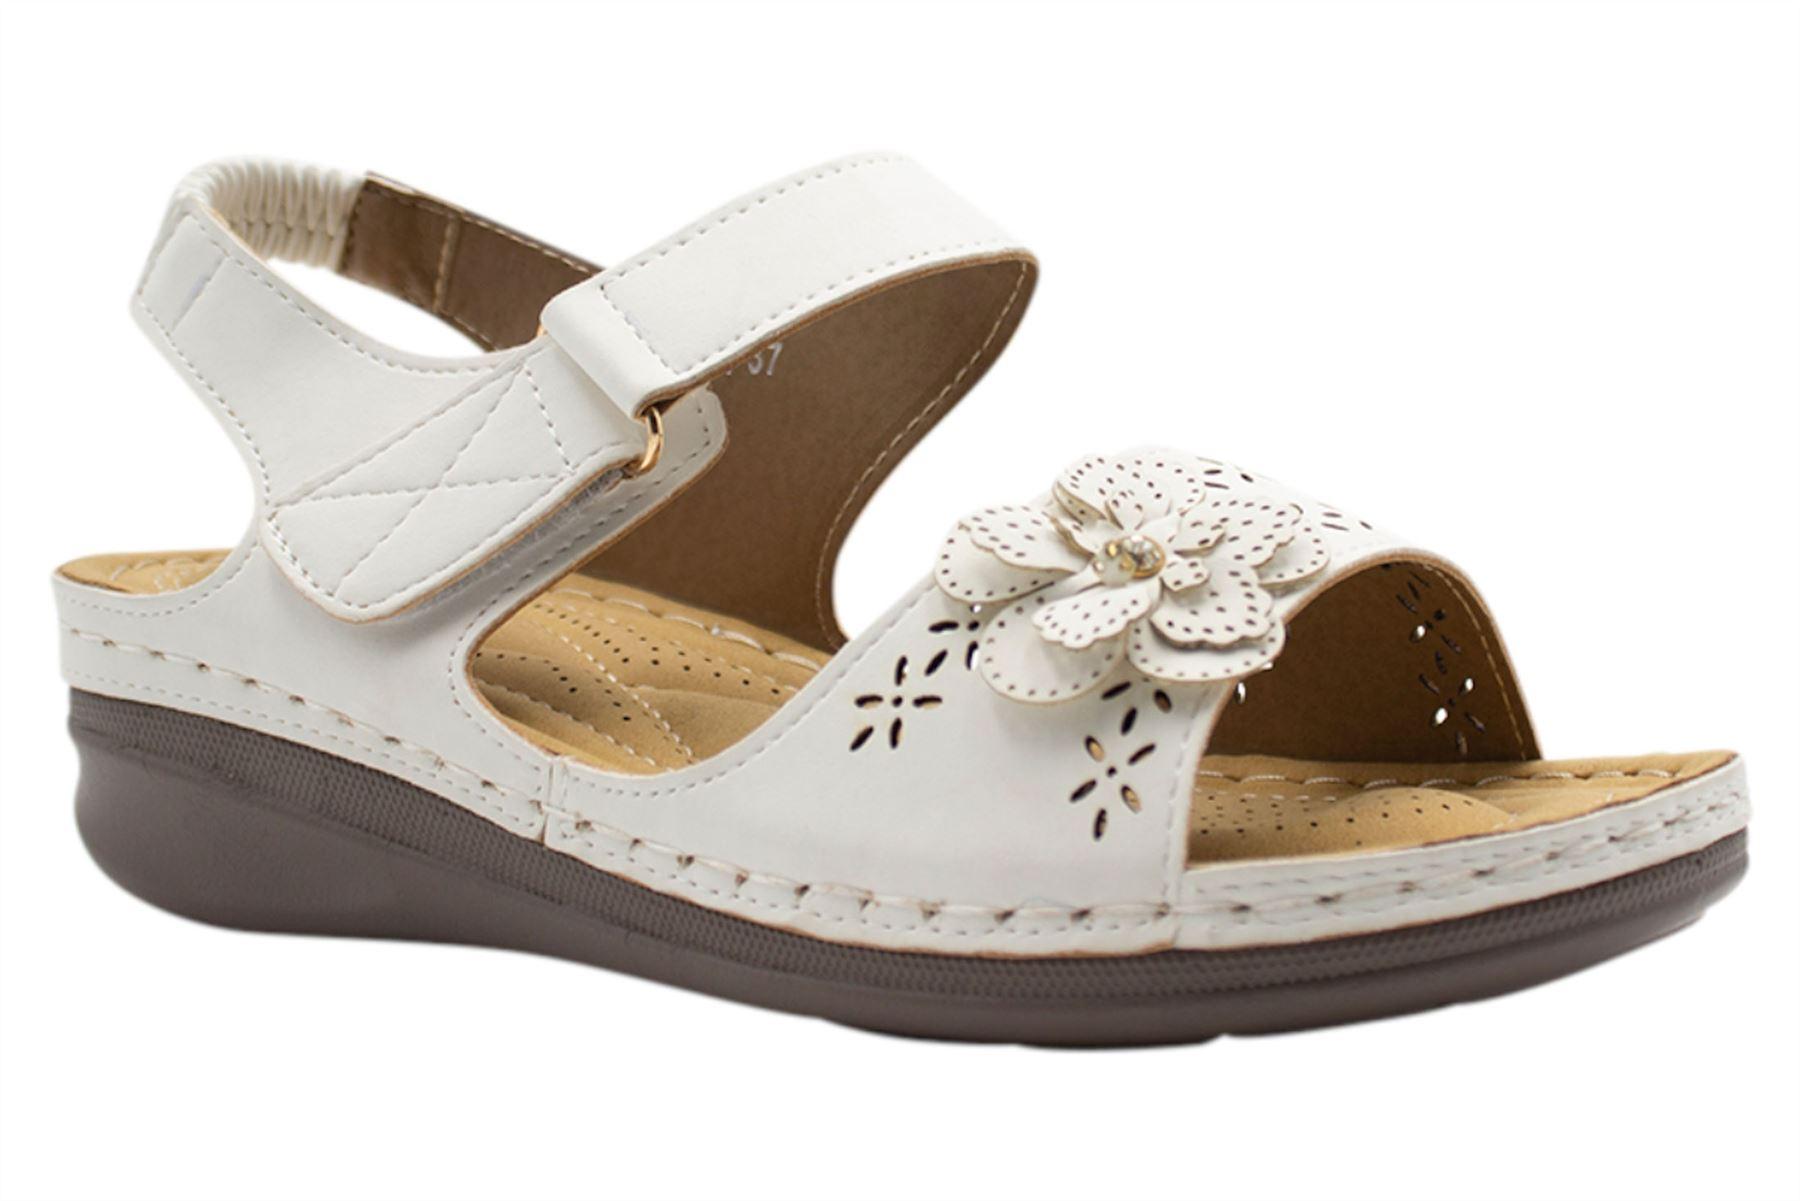 Ladies-Sandals-Womens-Mid-Heel-Comfort-Summer-Beach-Casual-Wear miniatura 41